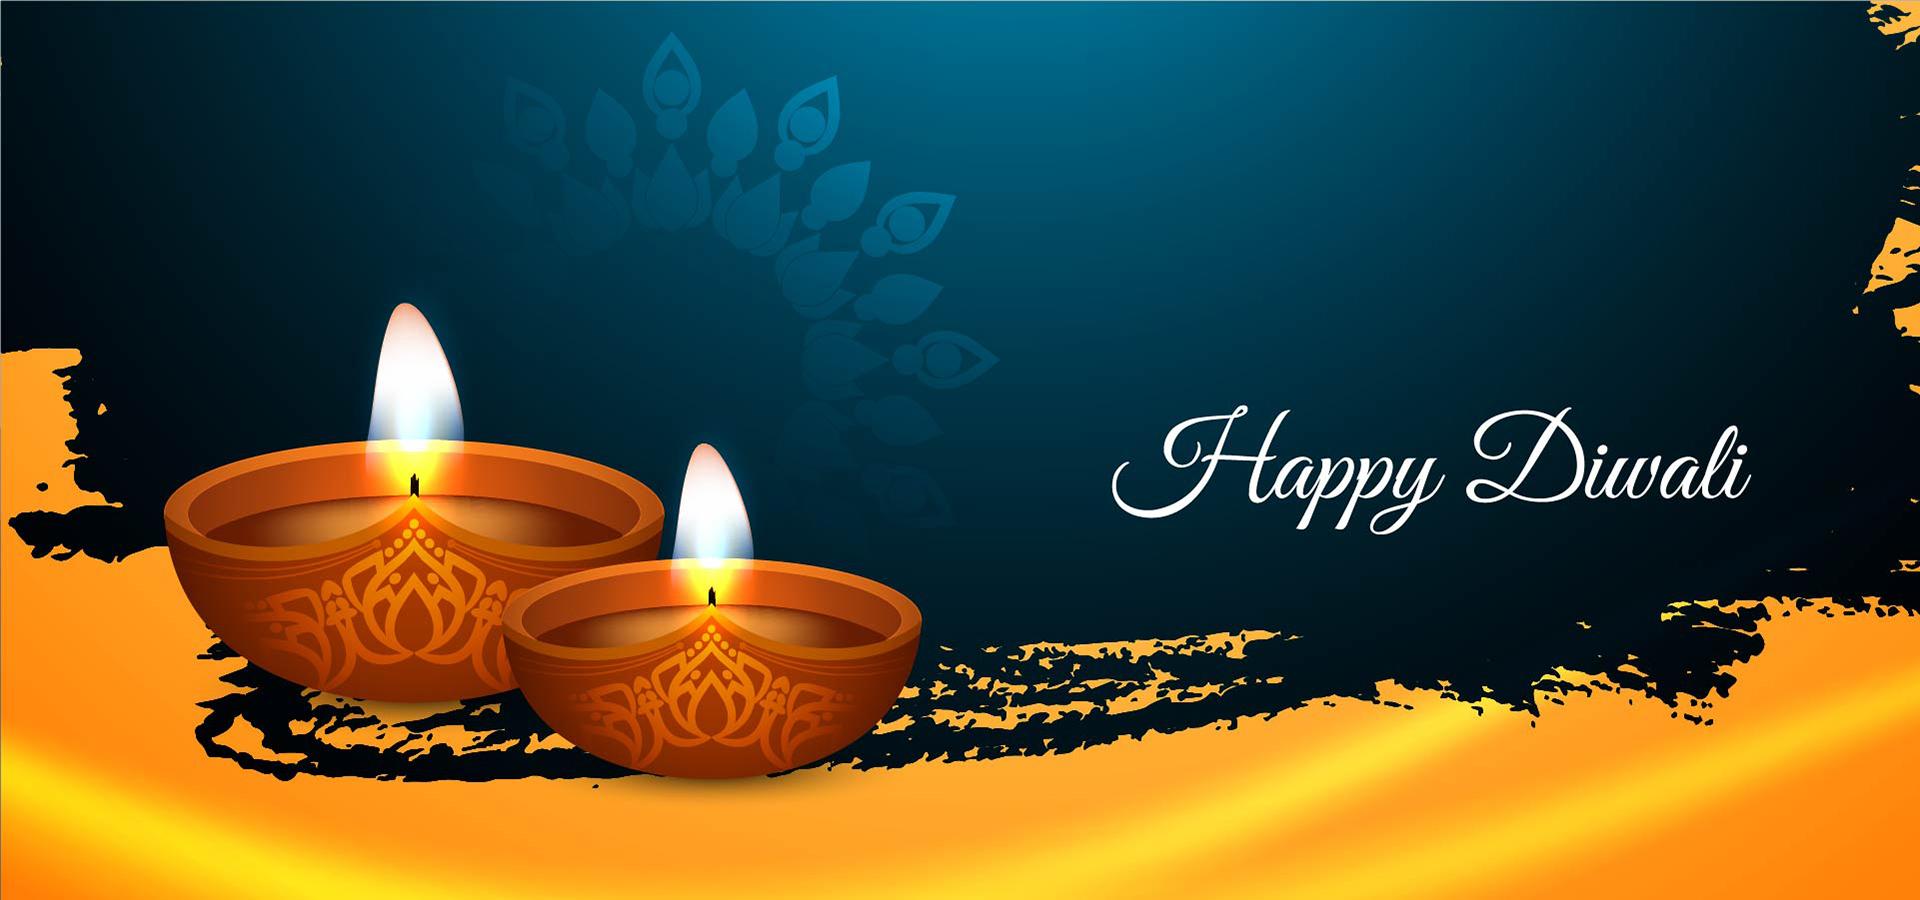 happy diwali colorful festive banner 676145  download